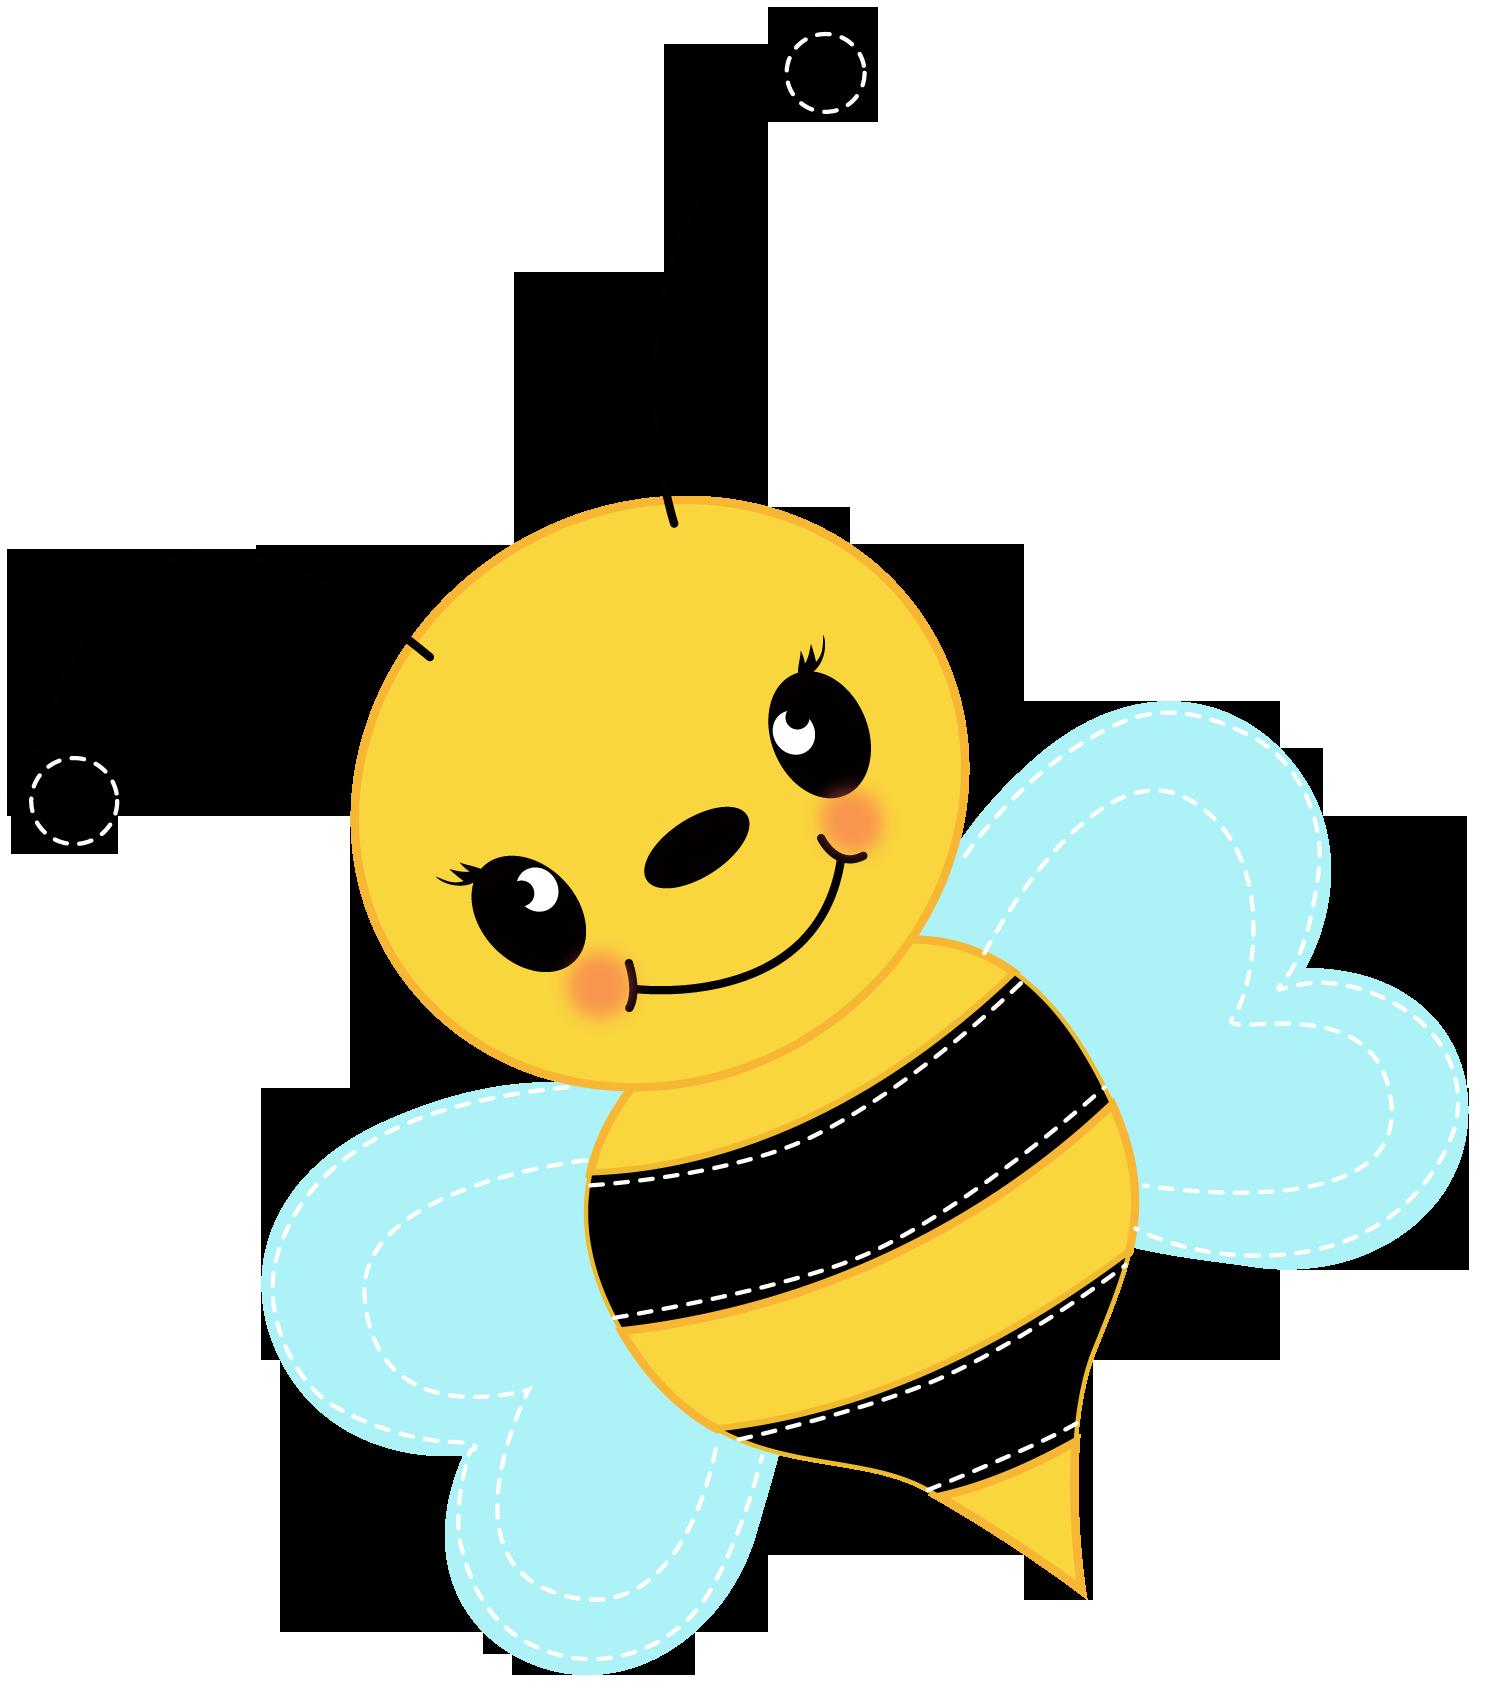 Baby girl bumblebee clipart vector royalty free download Cute girl bee clipart - ClipartFest vector royalty free download